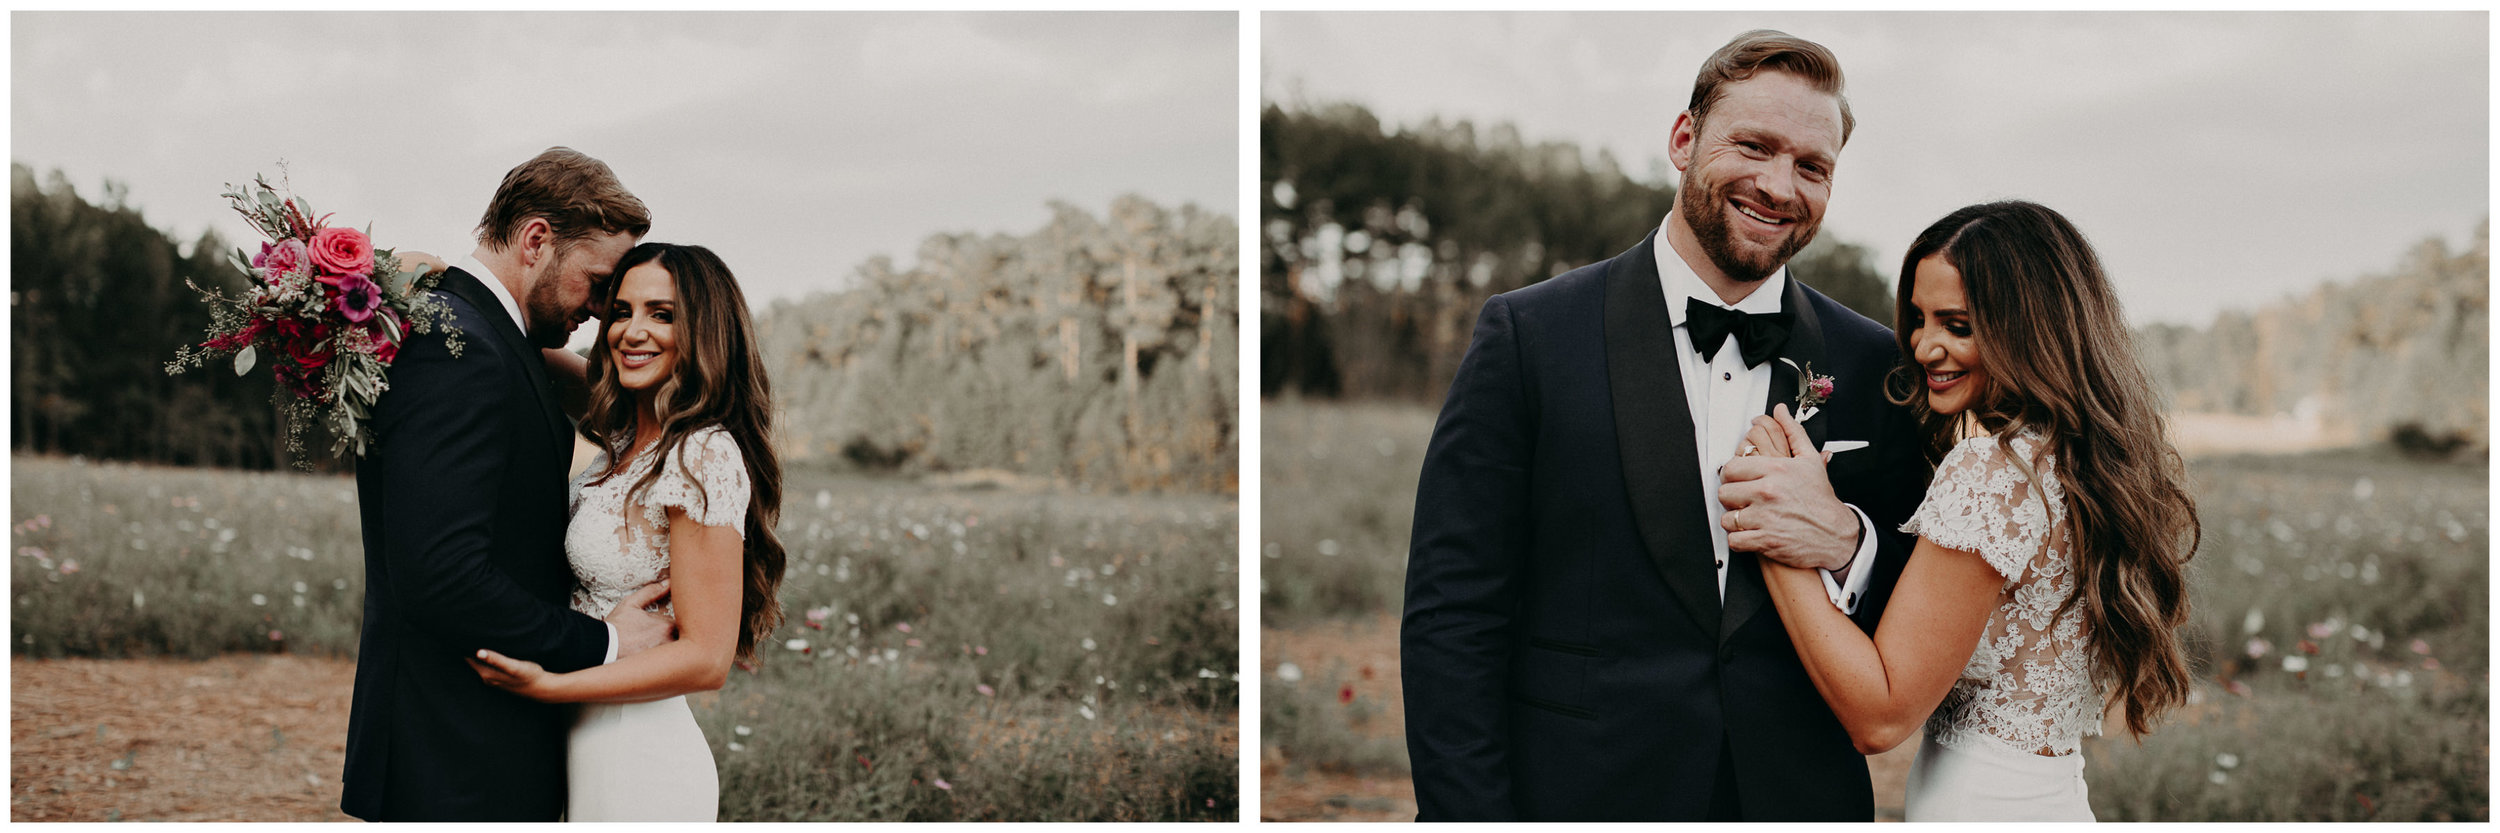 82 - Bride and groom portraits serenbi farms atlanta .jpg